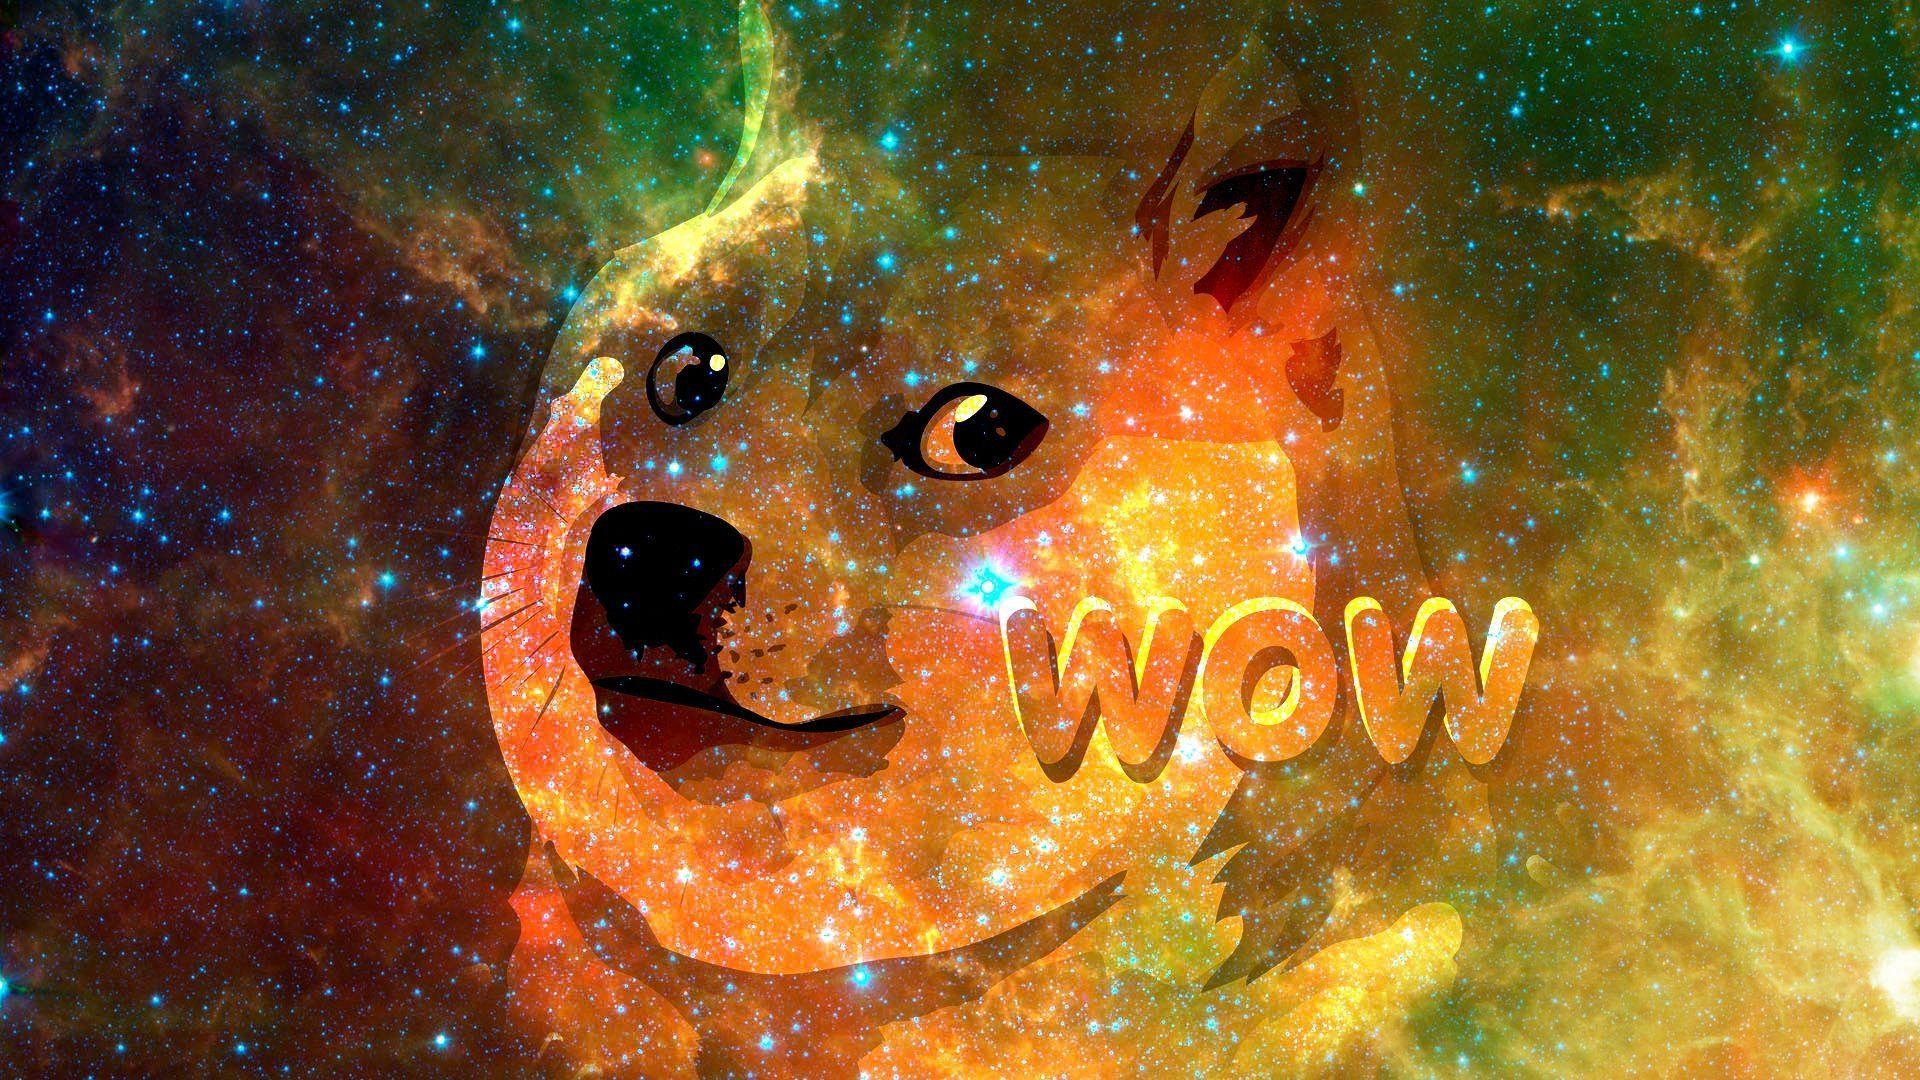 Doge Wallpaper Wow